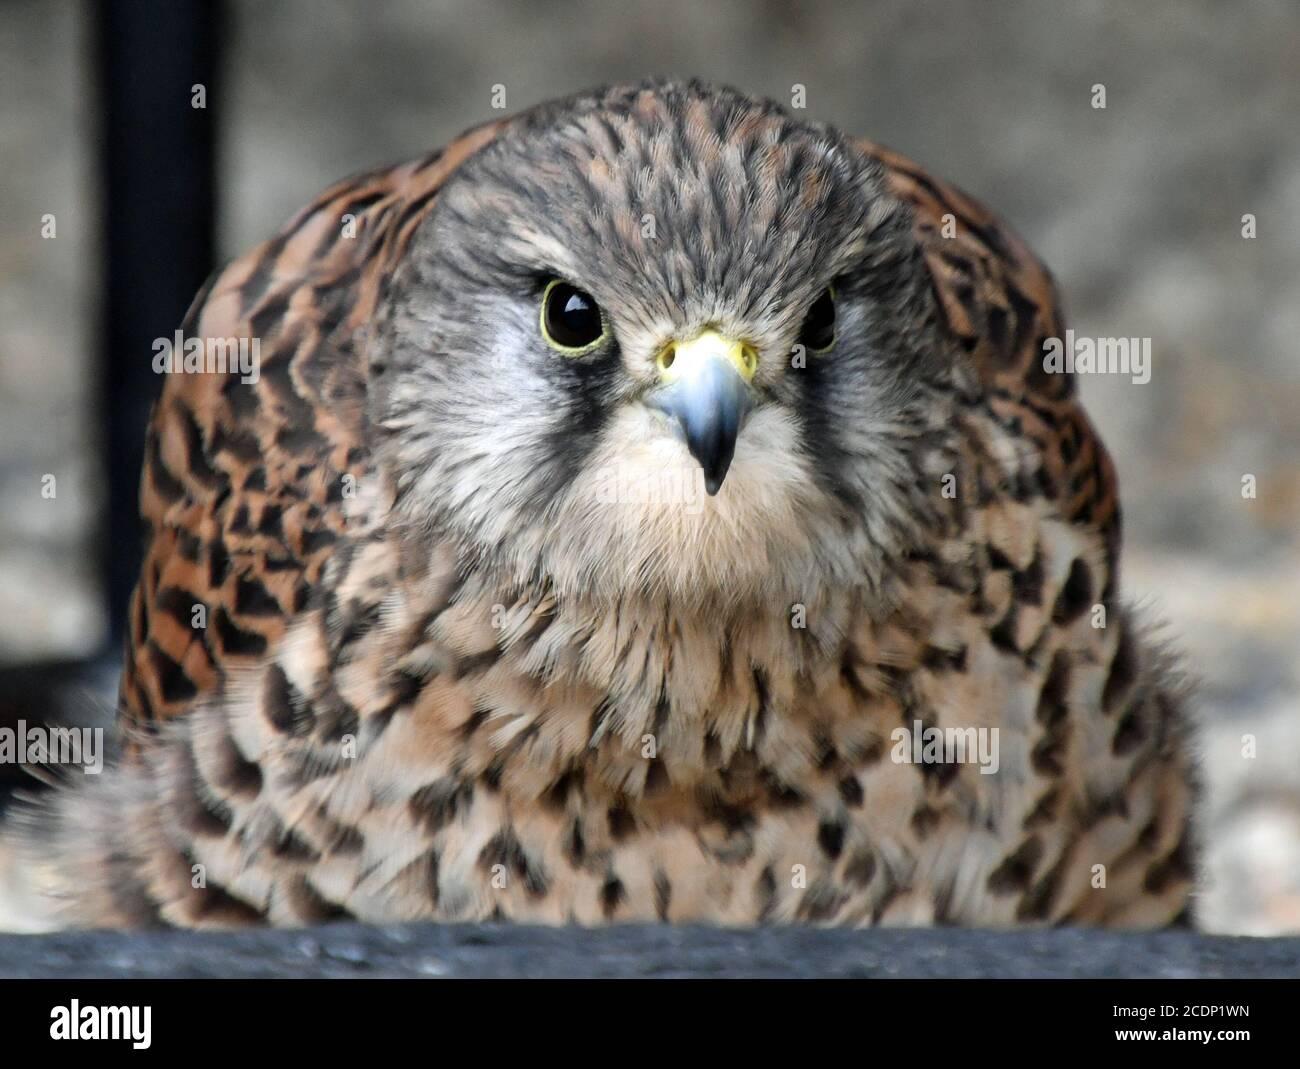 Suffolk Owl Sanctuary, Stonham Aspal, Suffolk, UK Stock Photo